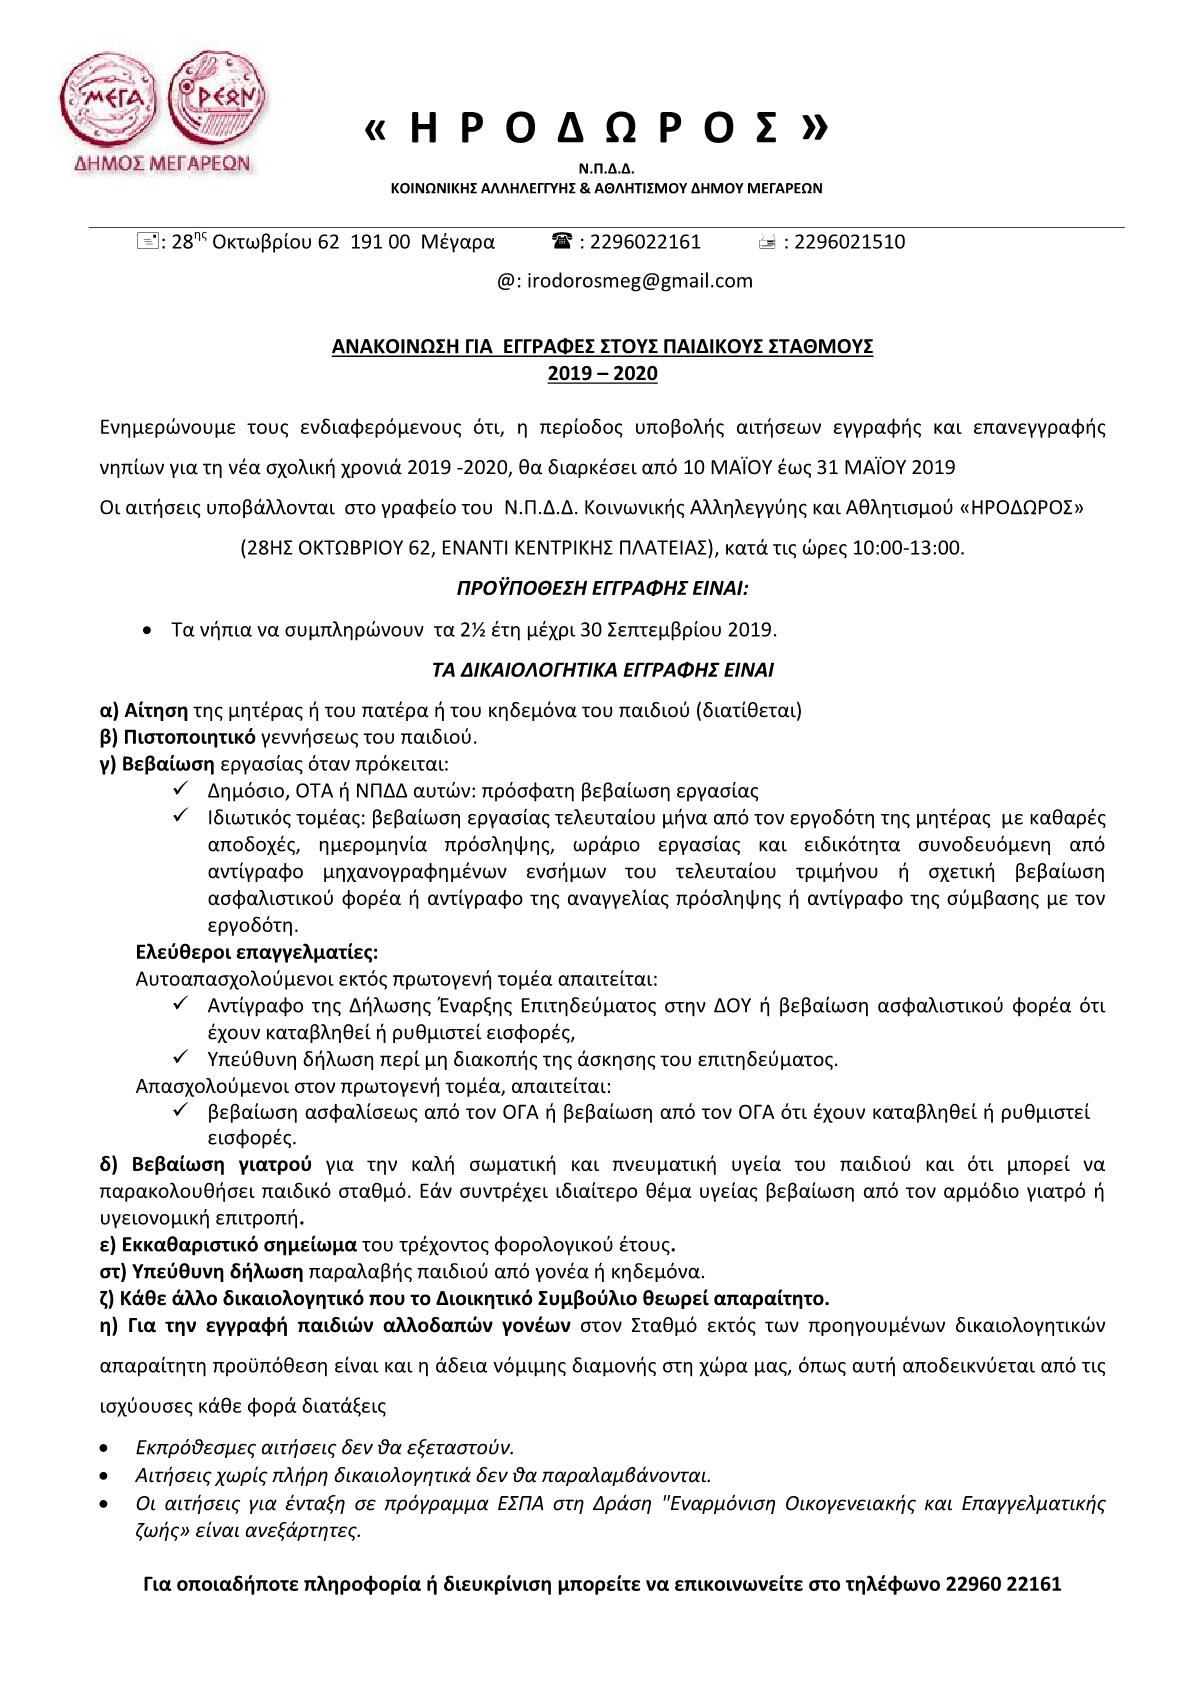 15f2a2a4490 Ανακοίνωση για εγγραφές στους παιδικούς σταθμούς για το 2019-2020 ...